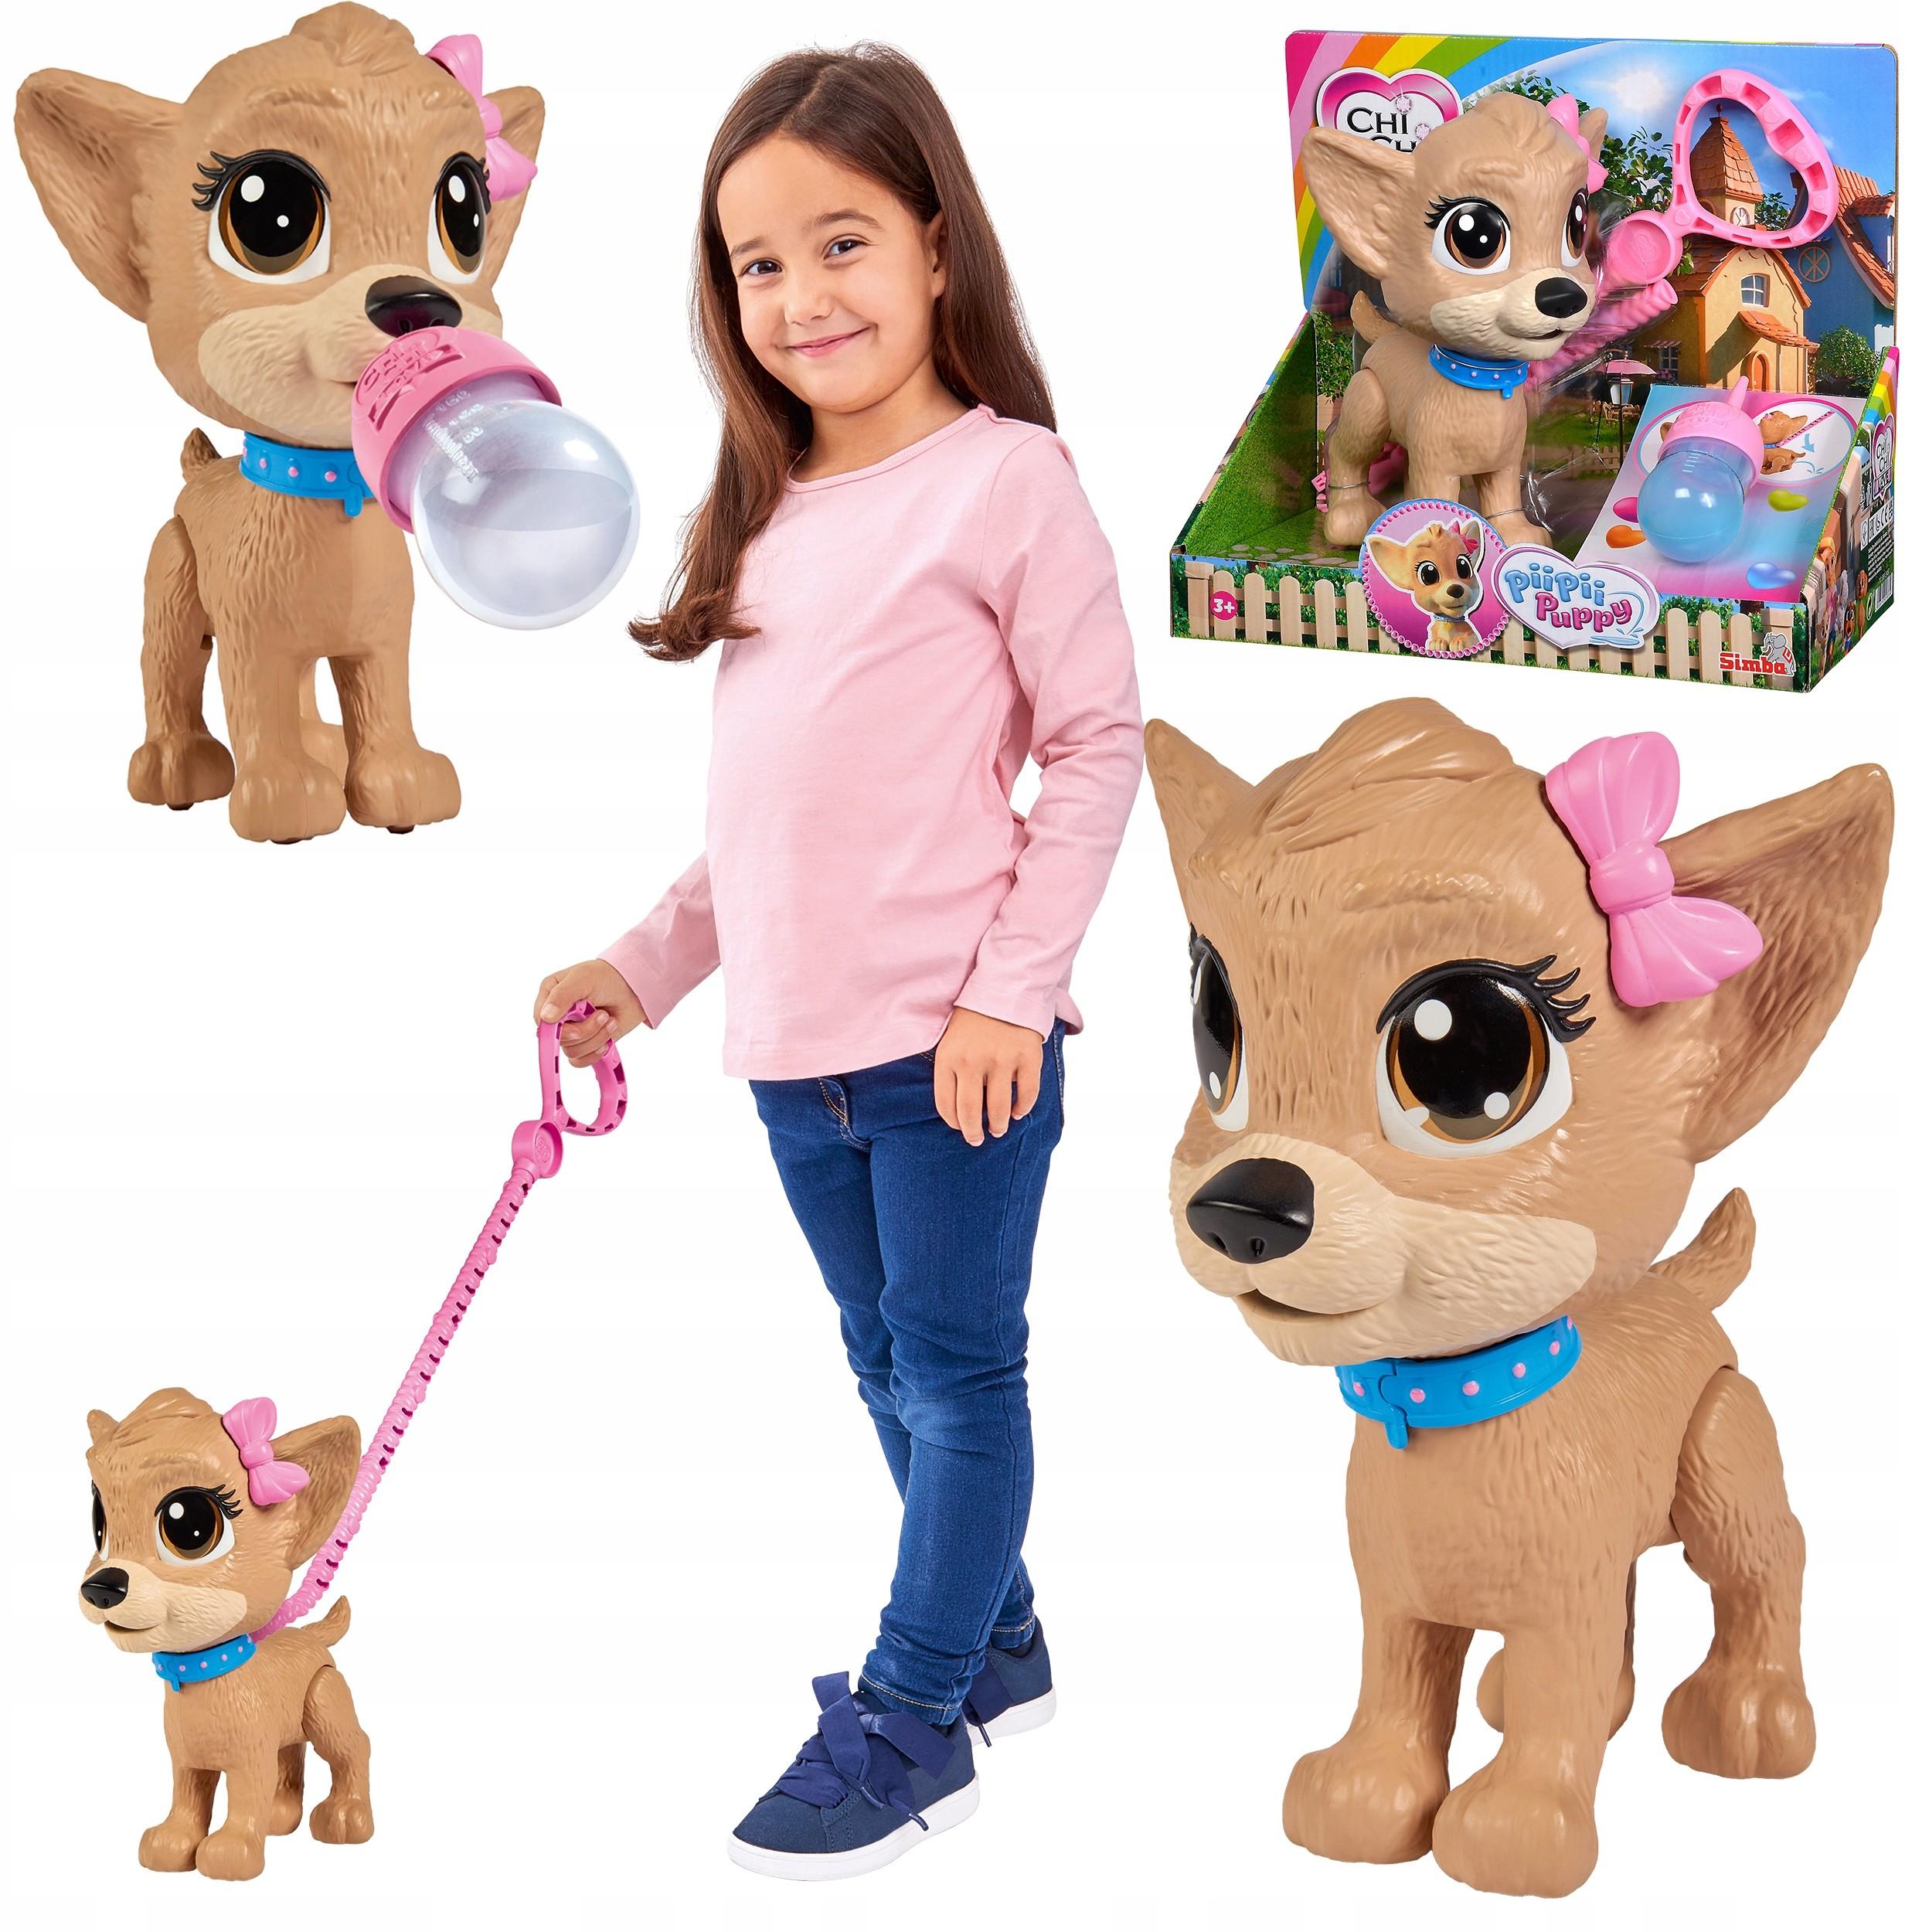 Piesek Interaktywny Chi Chi Pii Pii Puppy Siusia